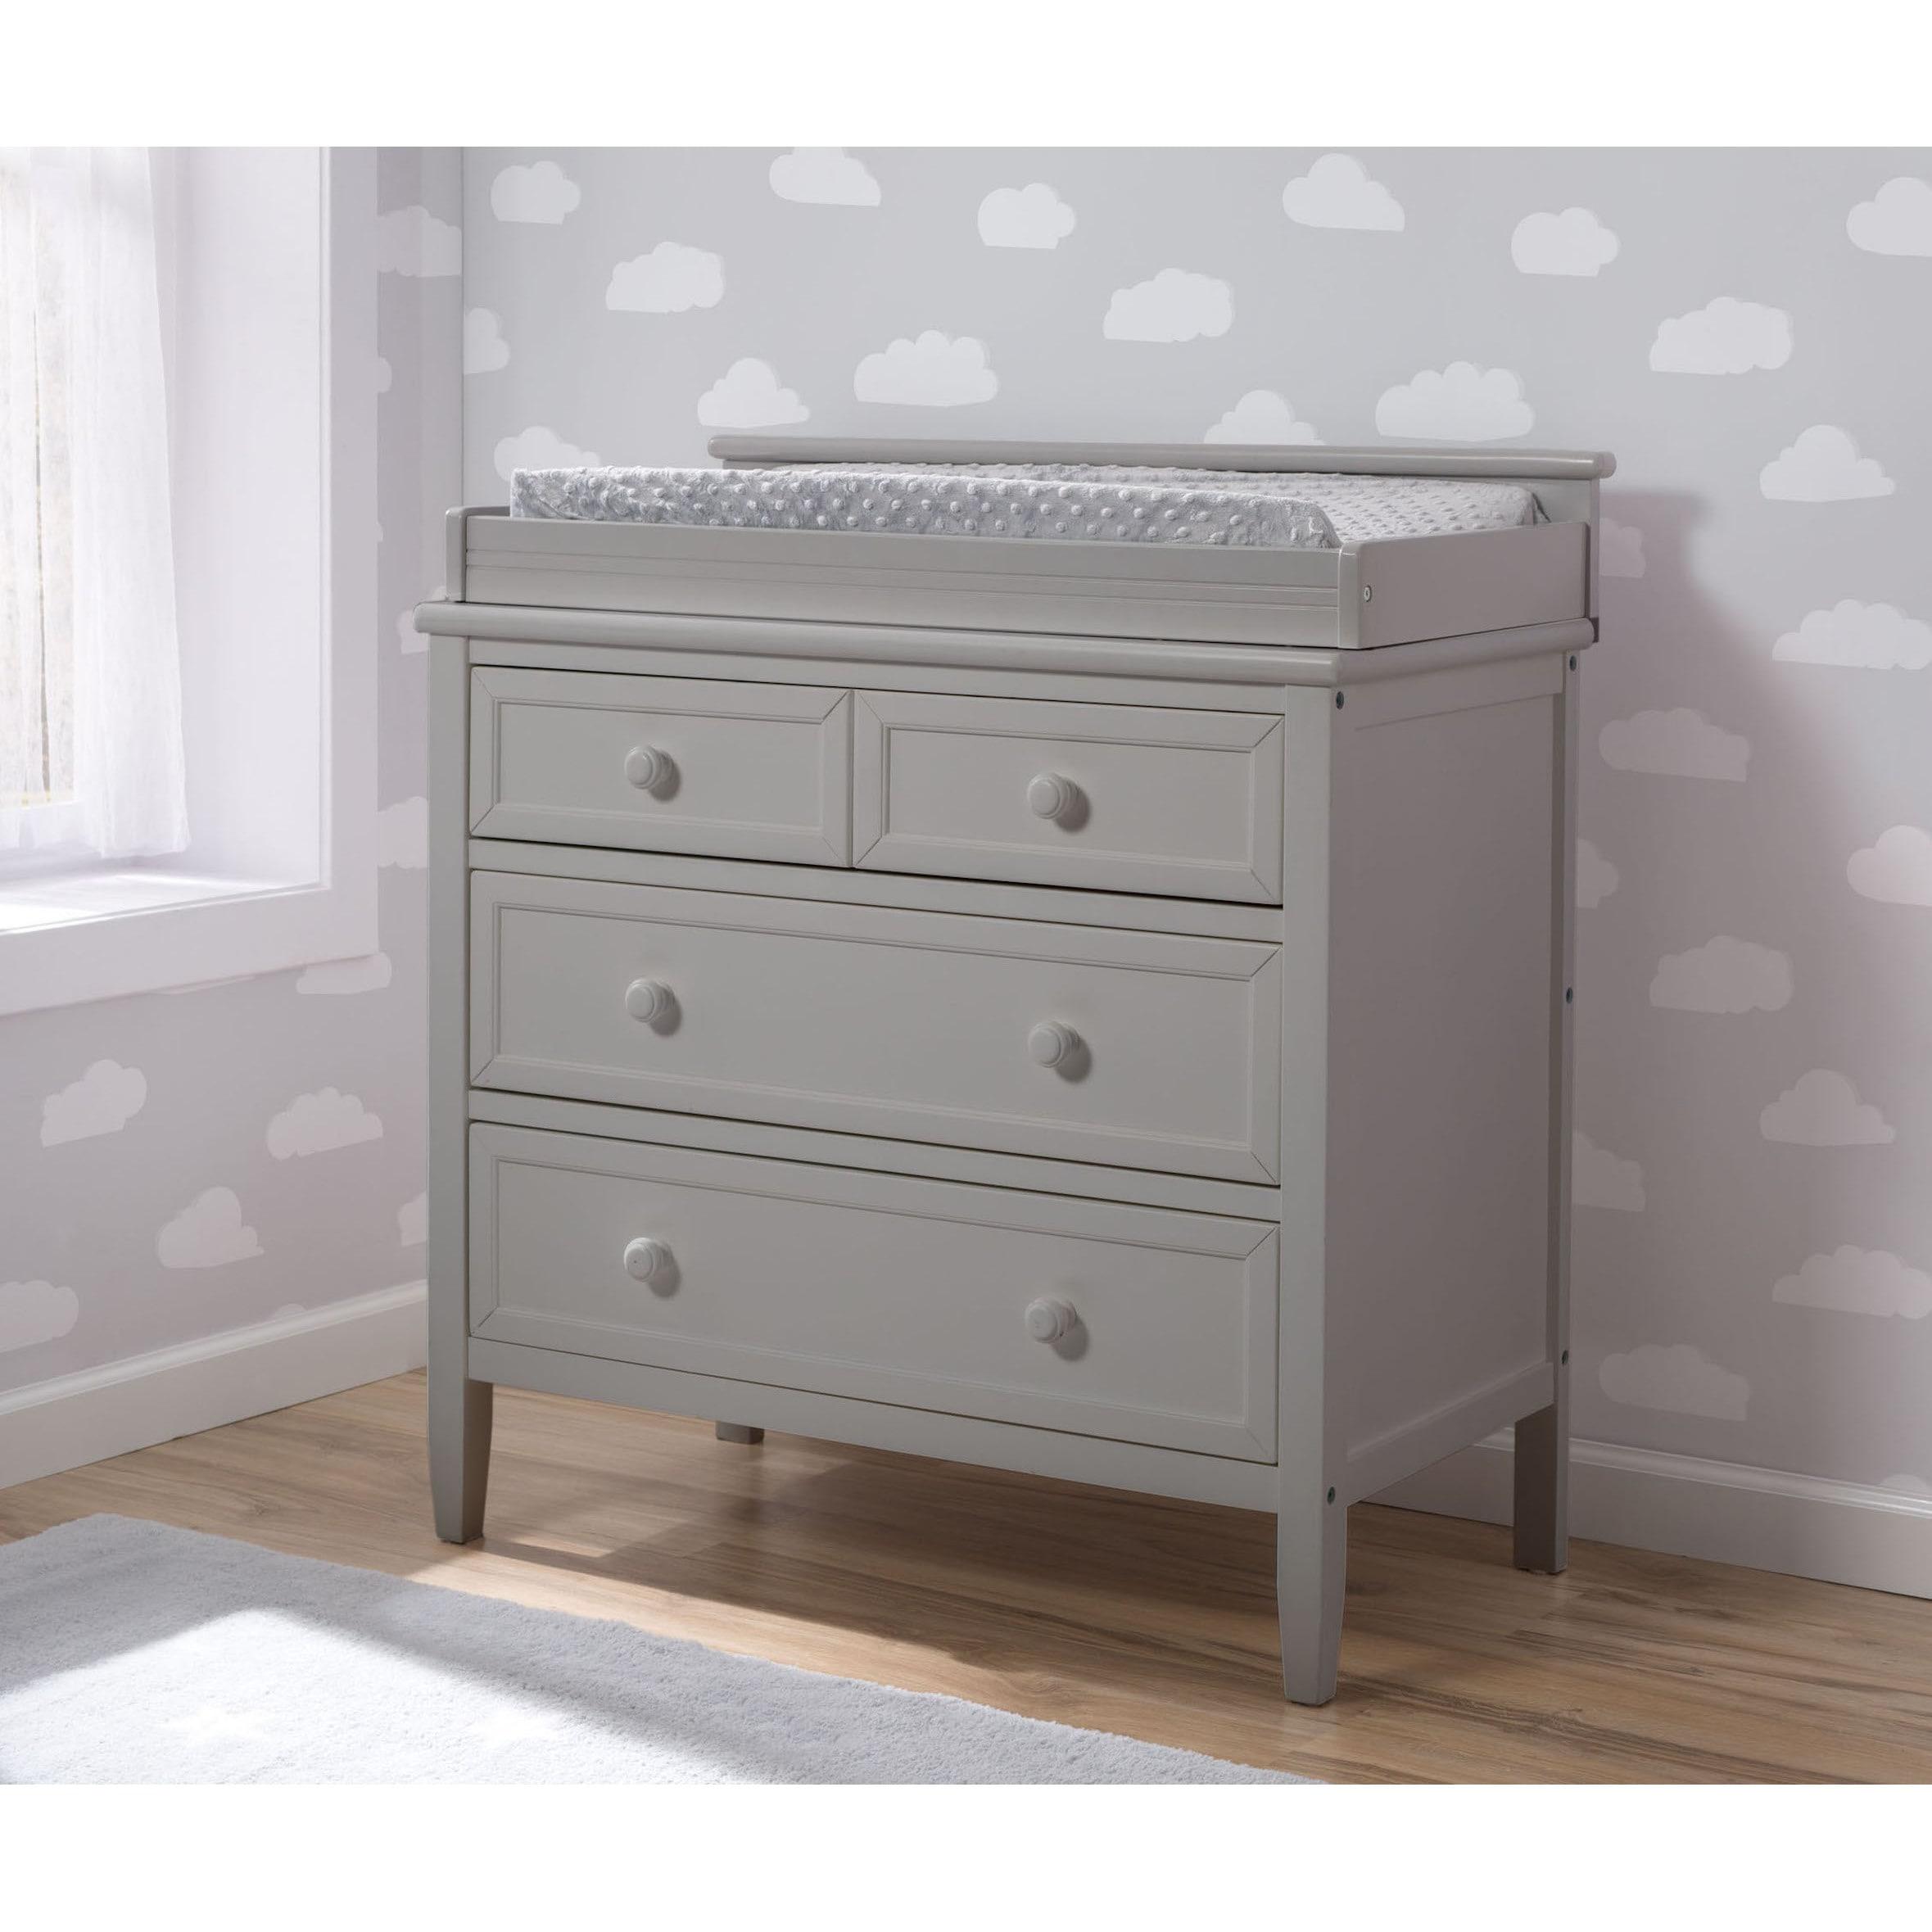 Epic Signature 3 Drawer Dresser